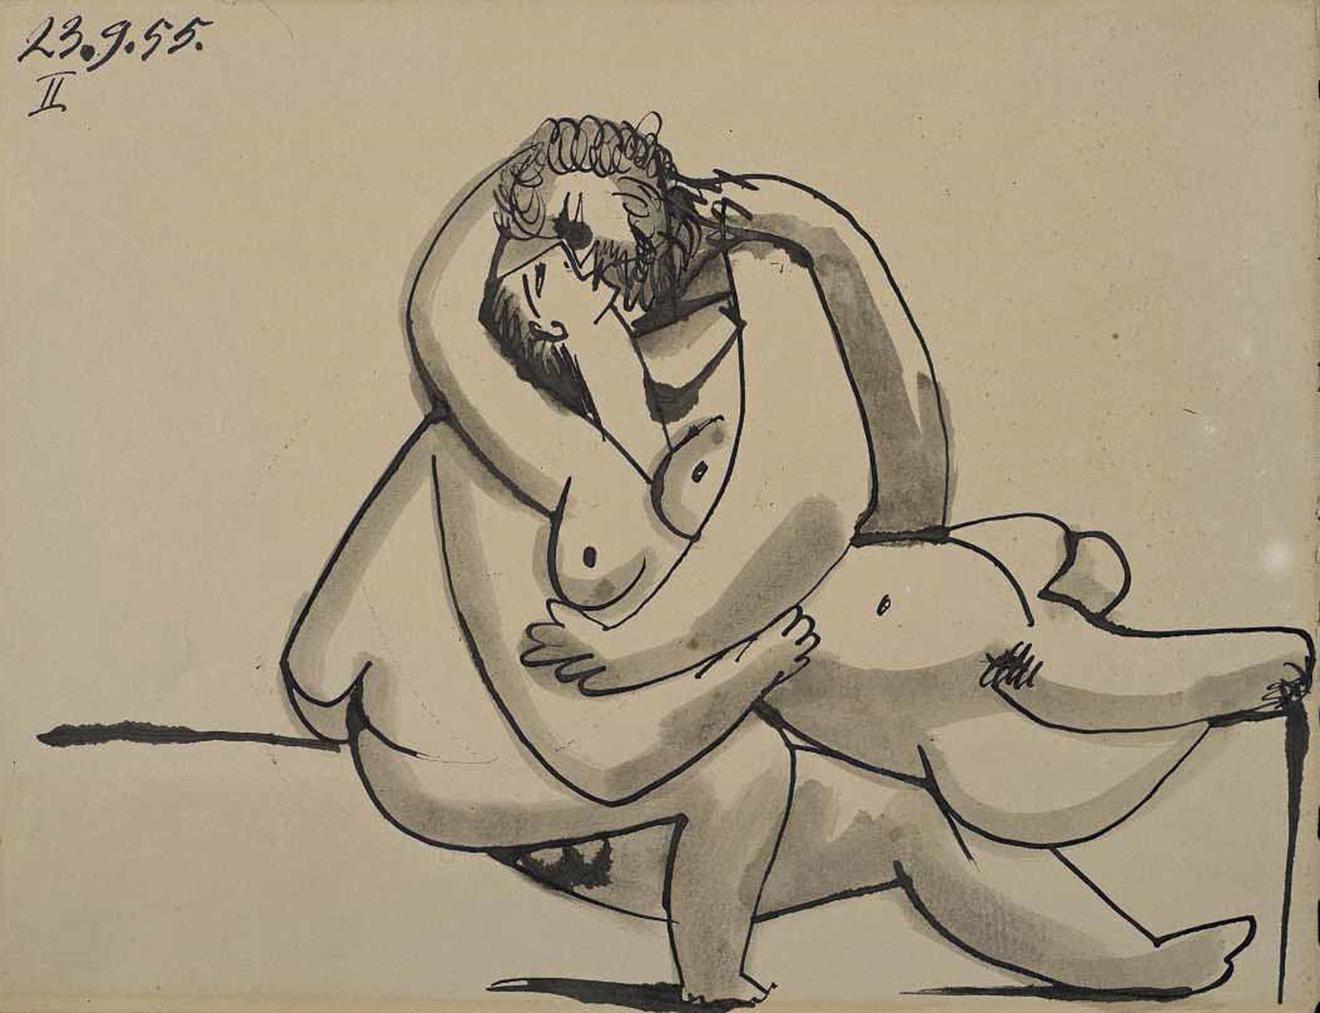 Pablo Picasso-Homme Et Femme Nus-1955